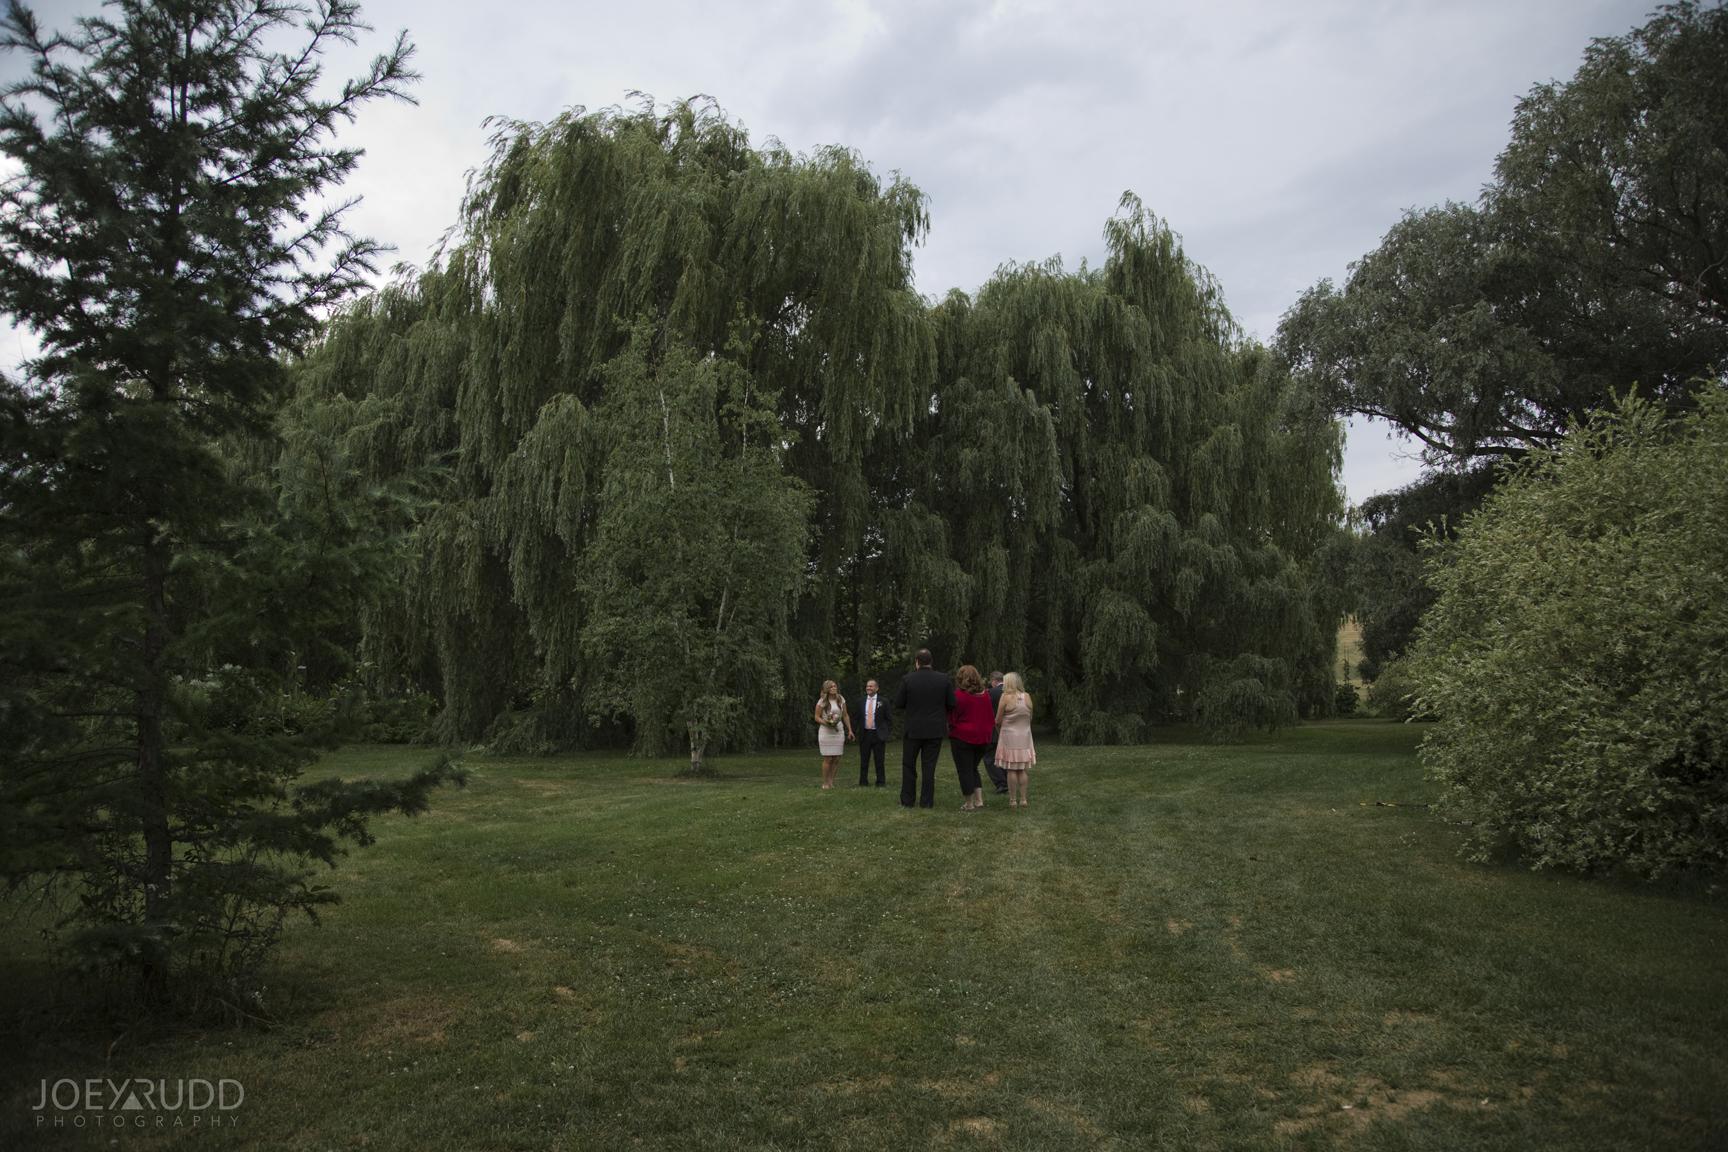 Elopement Wedding by Ottawa Wedding Photographer Joey Rudd Photography Arboretum Ceremony Experimental Farm